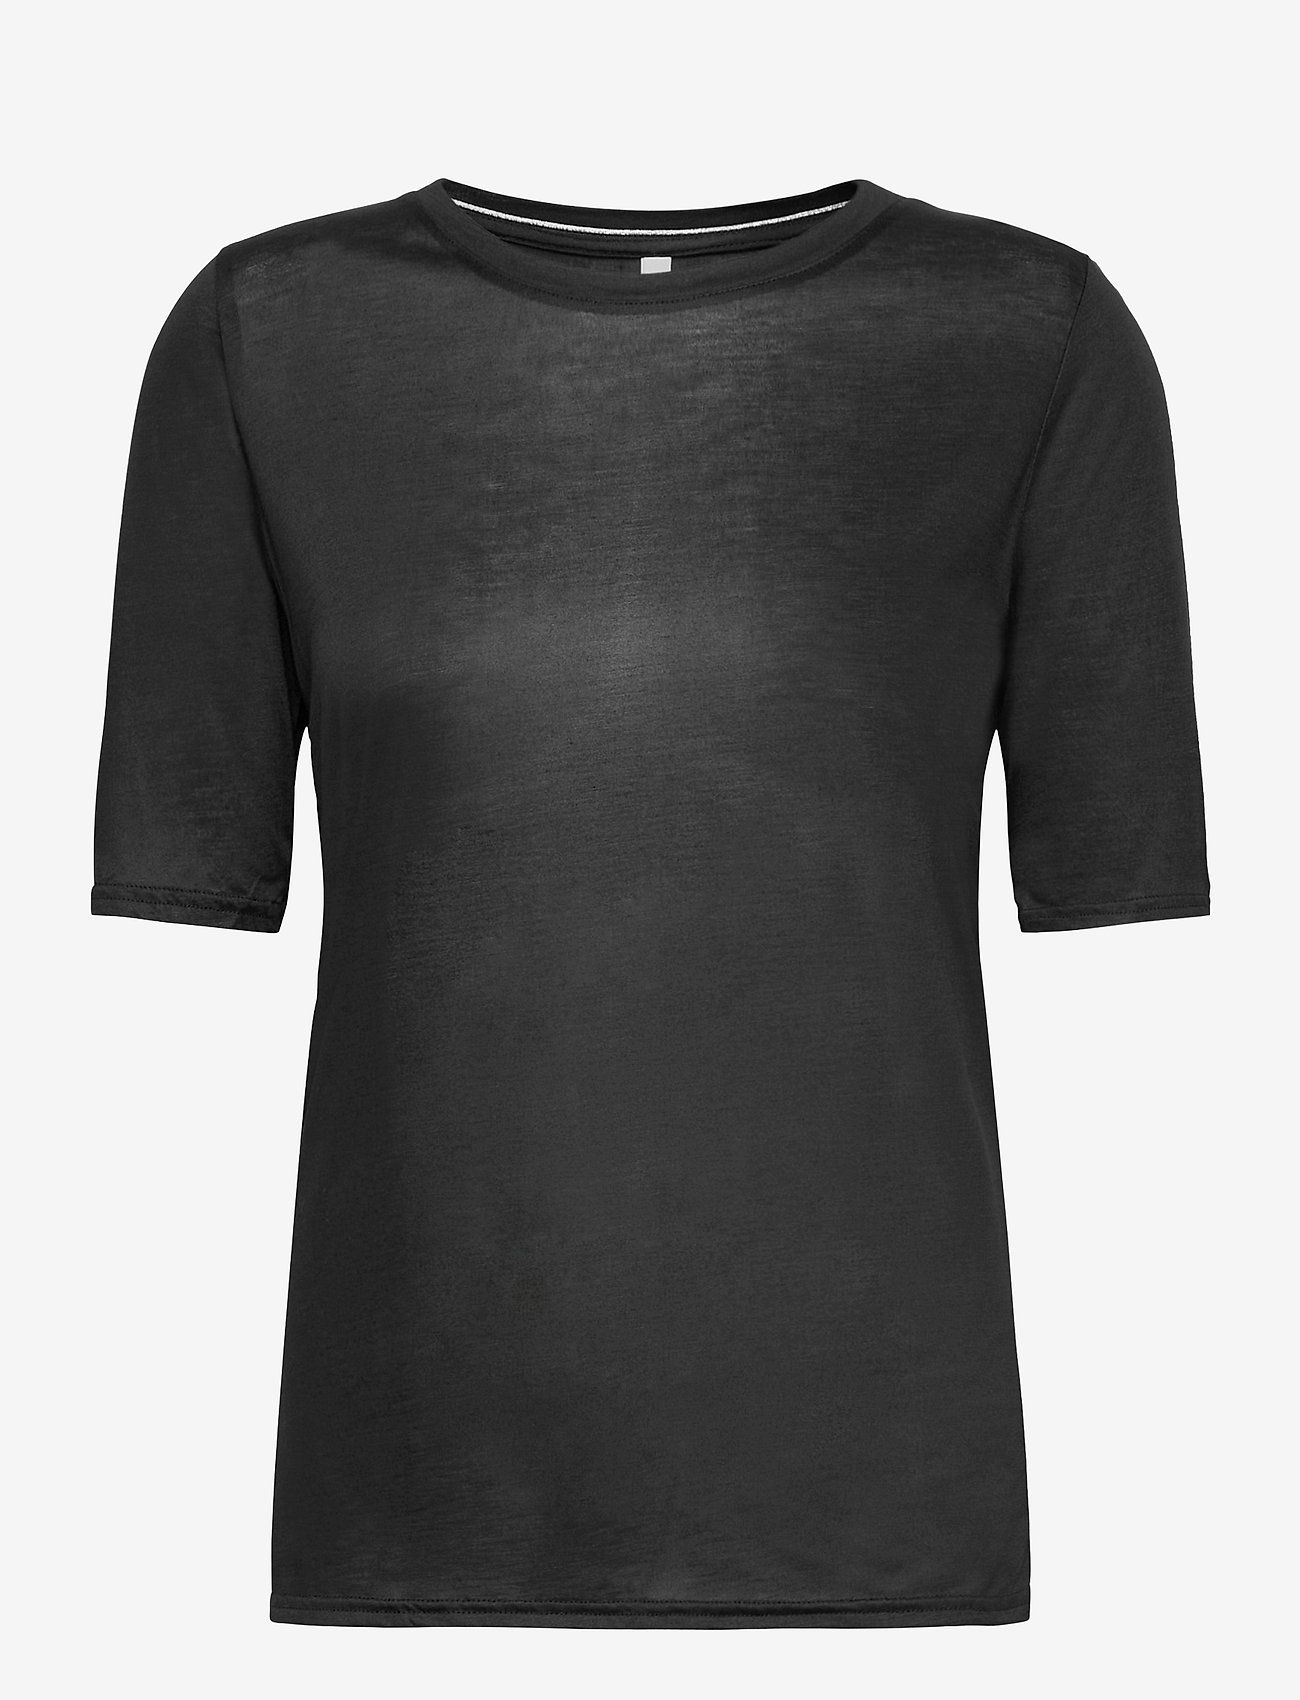 Pulz Jeans - PZCARLA t-shirt - t-shirts - black beauty - 0